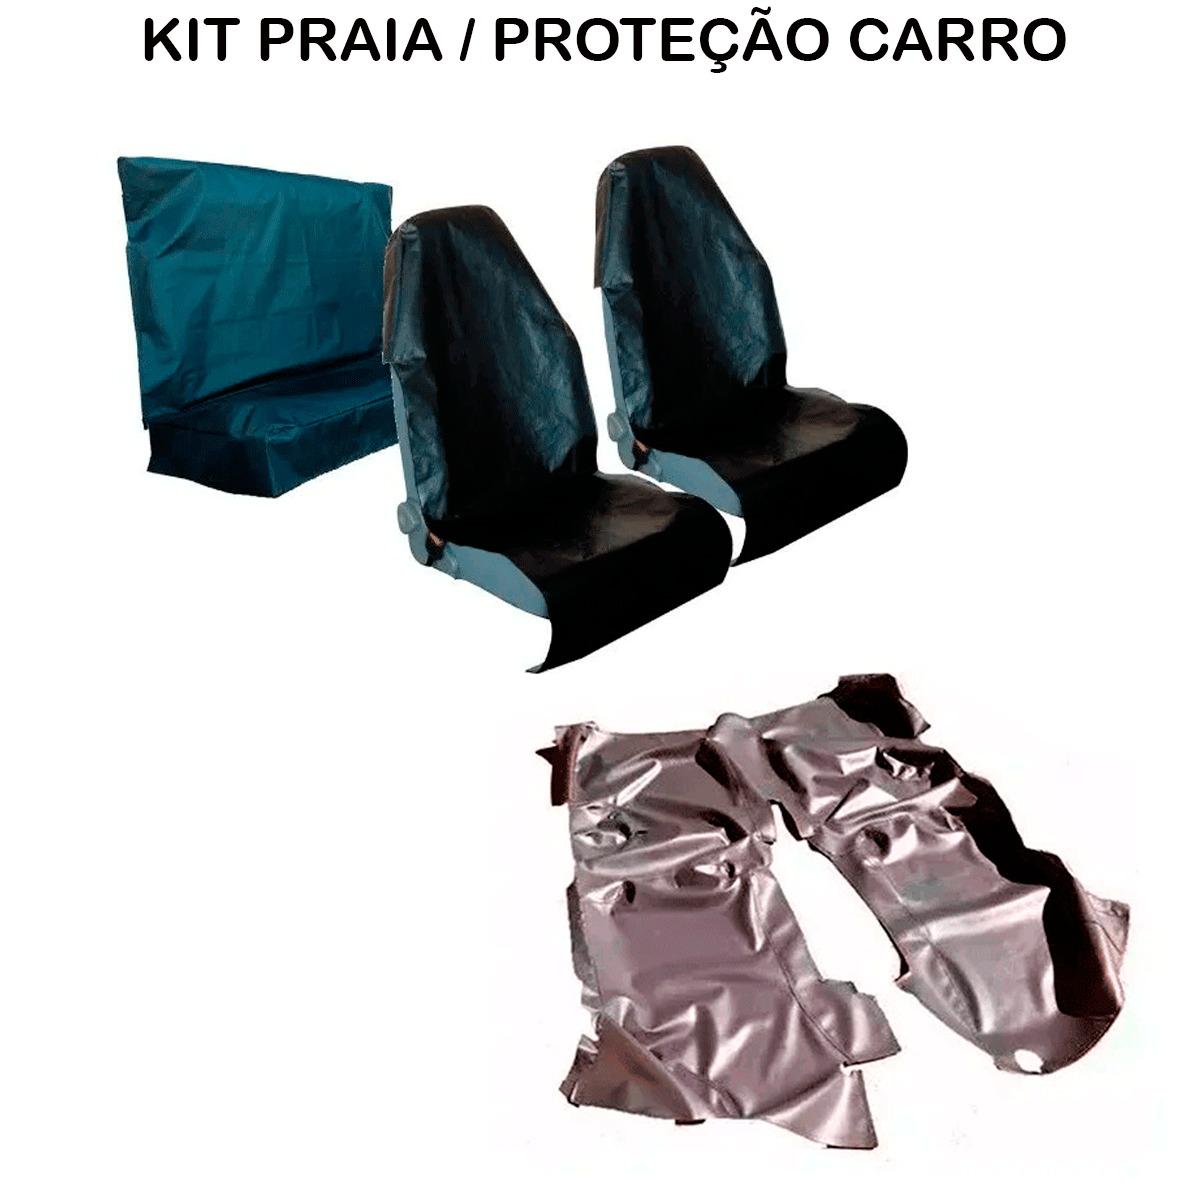 Tapete Em Vinil Volkswagen Variant + Capa Banco Protecao Banco Areia Suor Academia